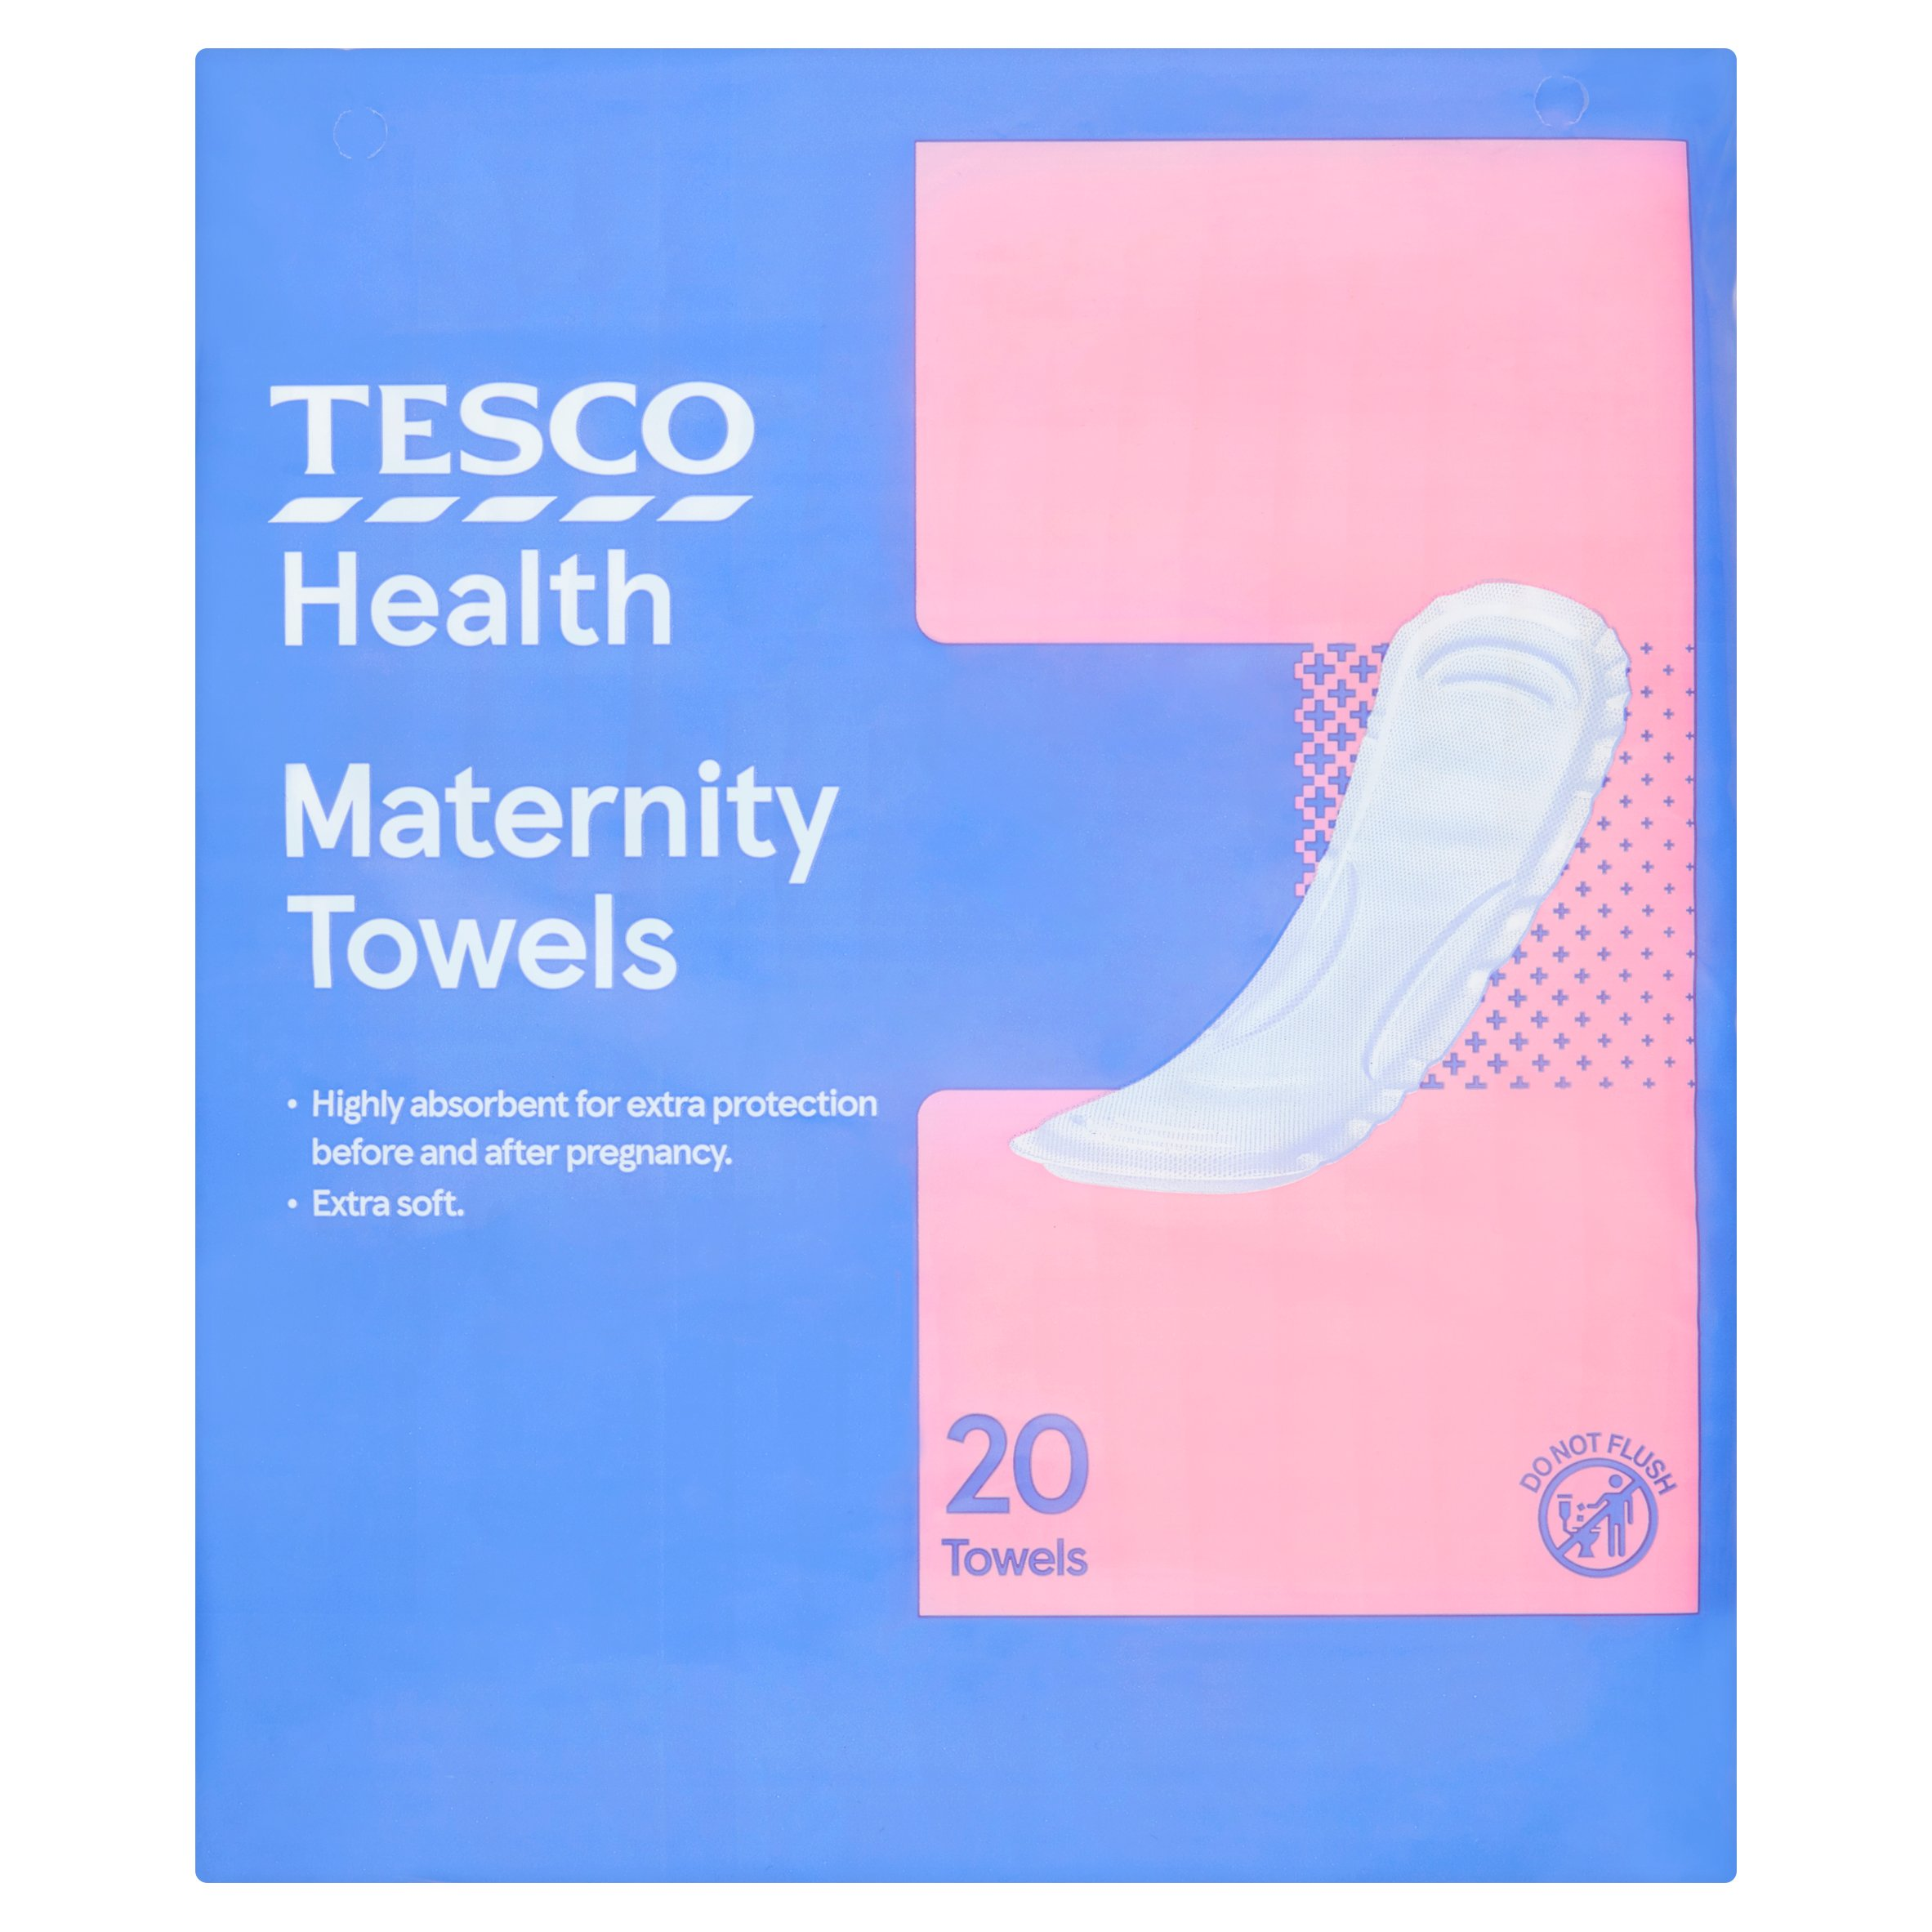 Tesco Maternity Towel 20 Pack